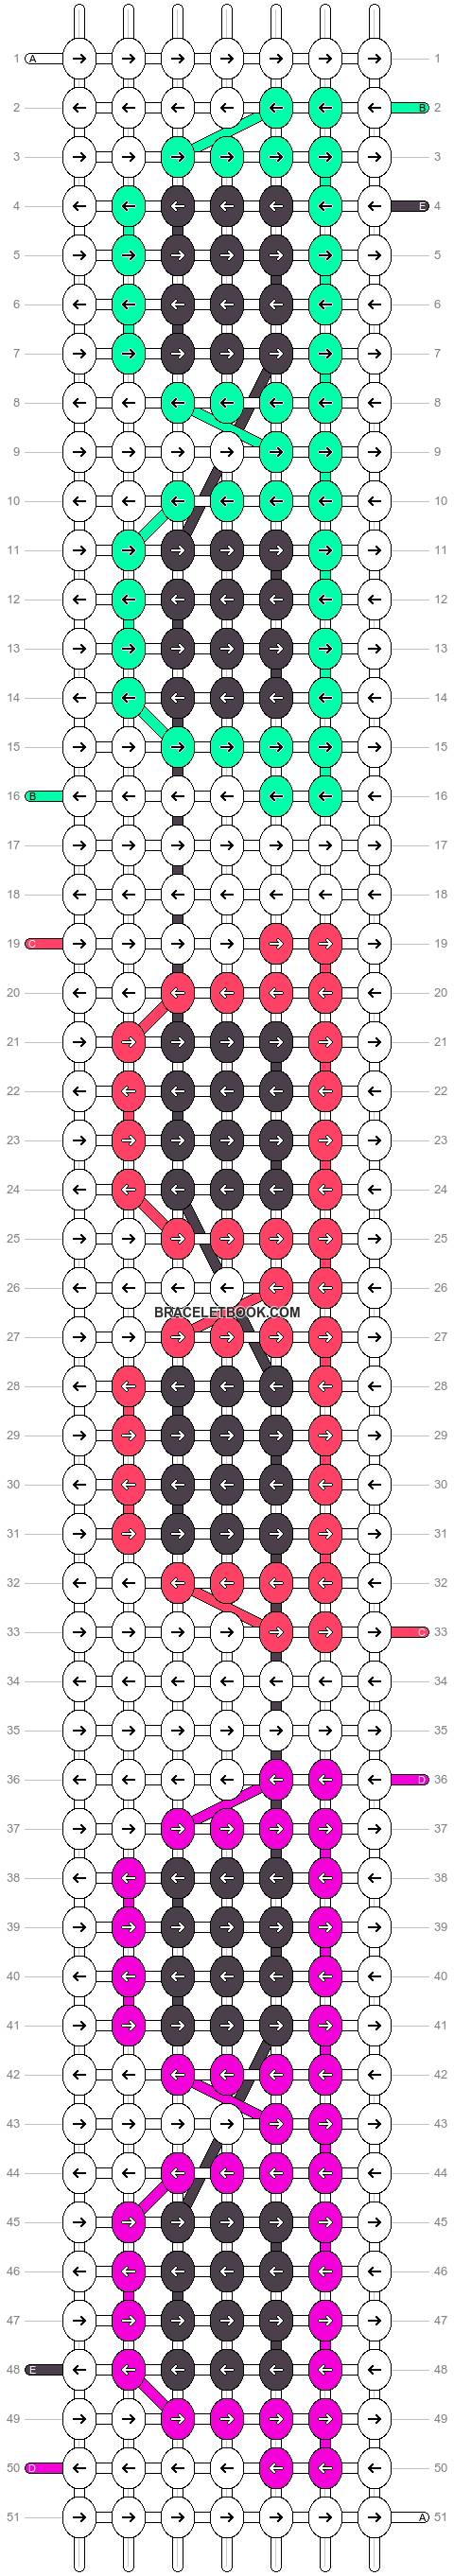 Alpha pattern #18480 pattern